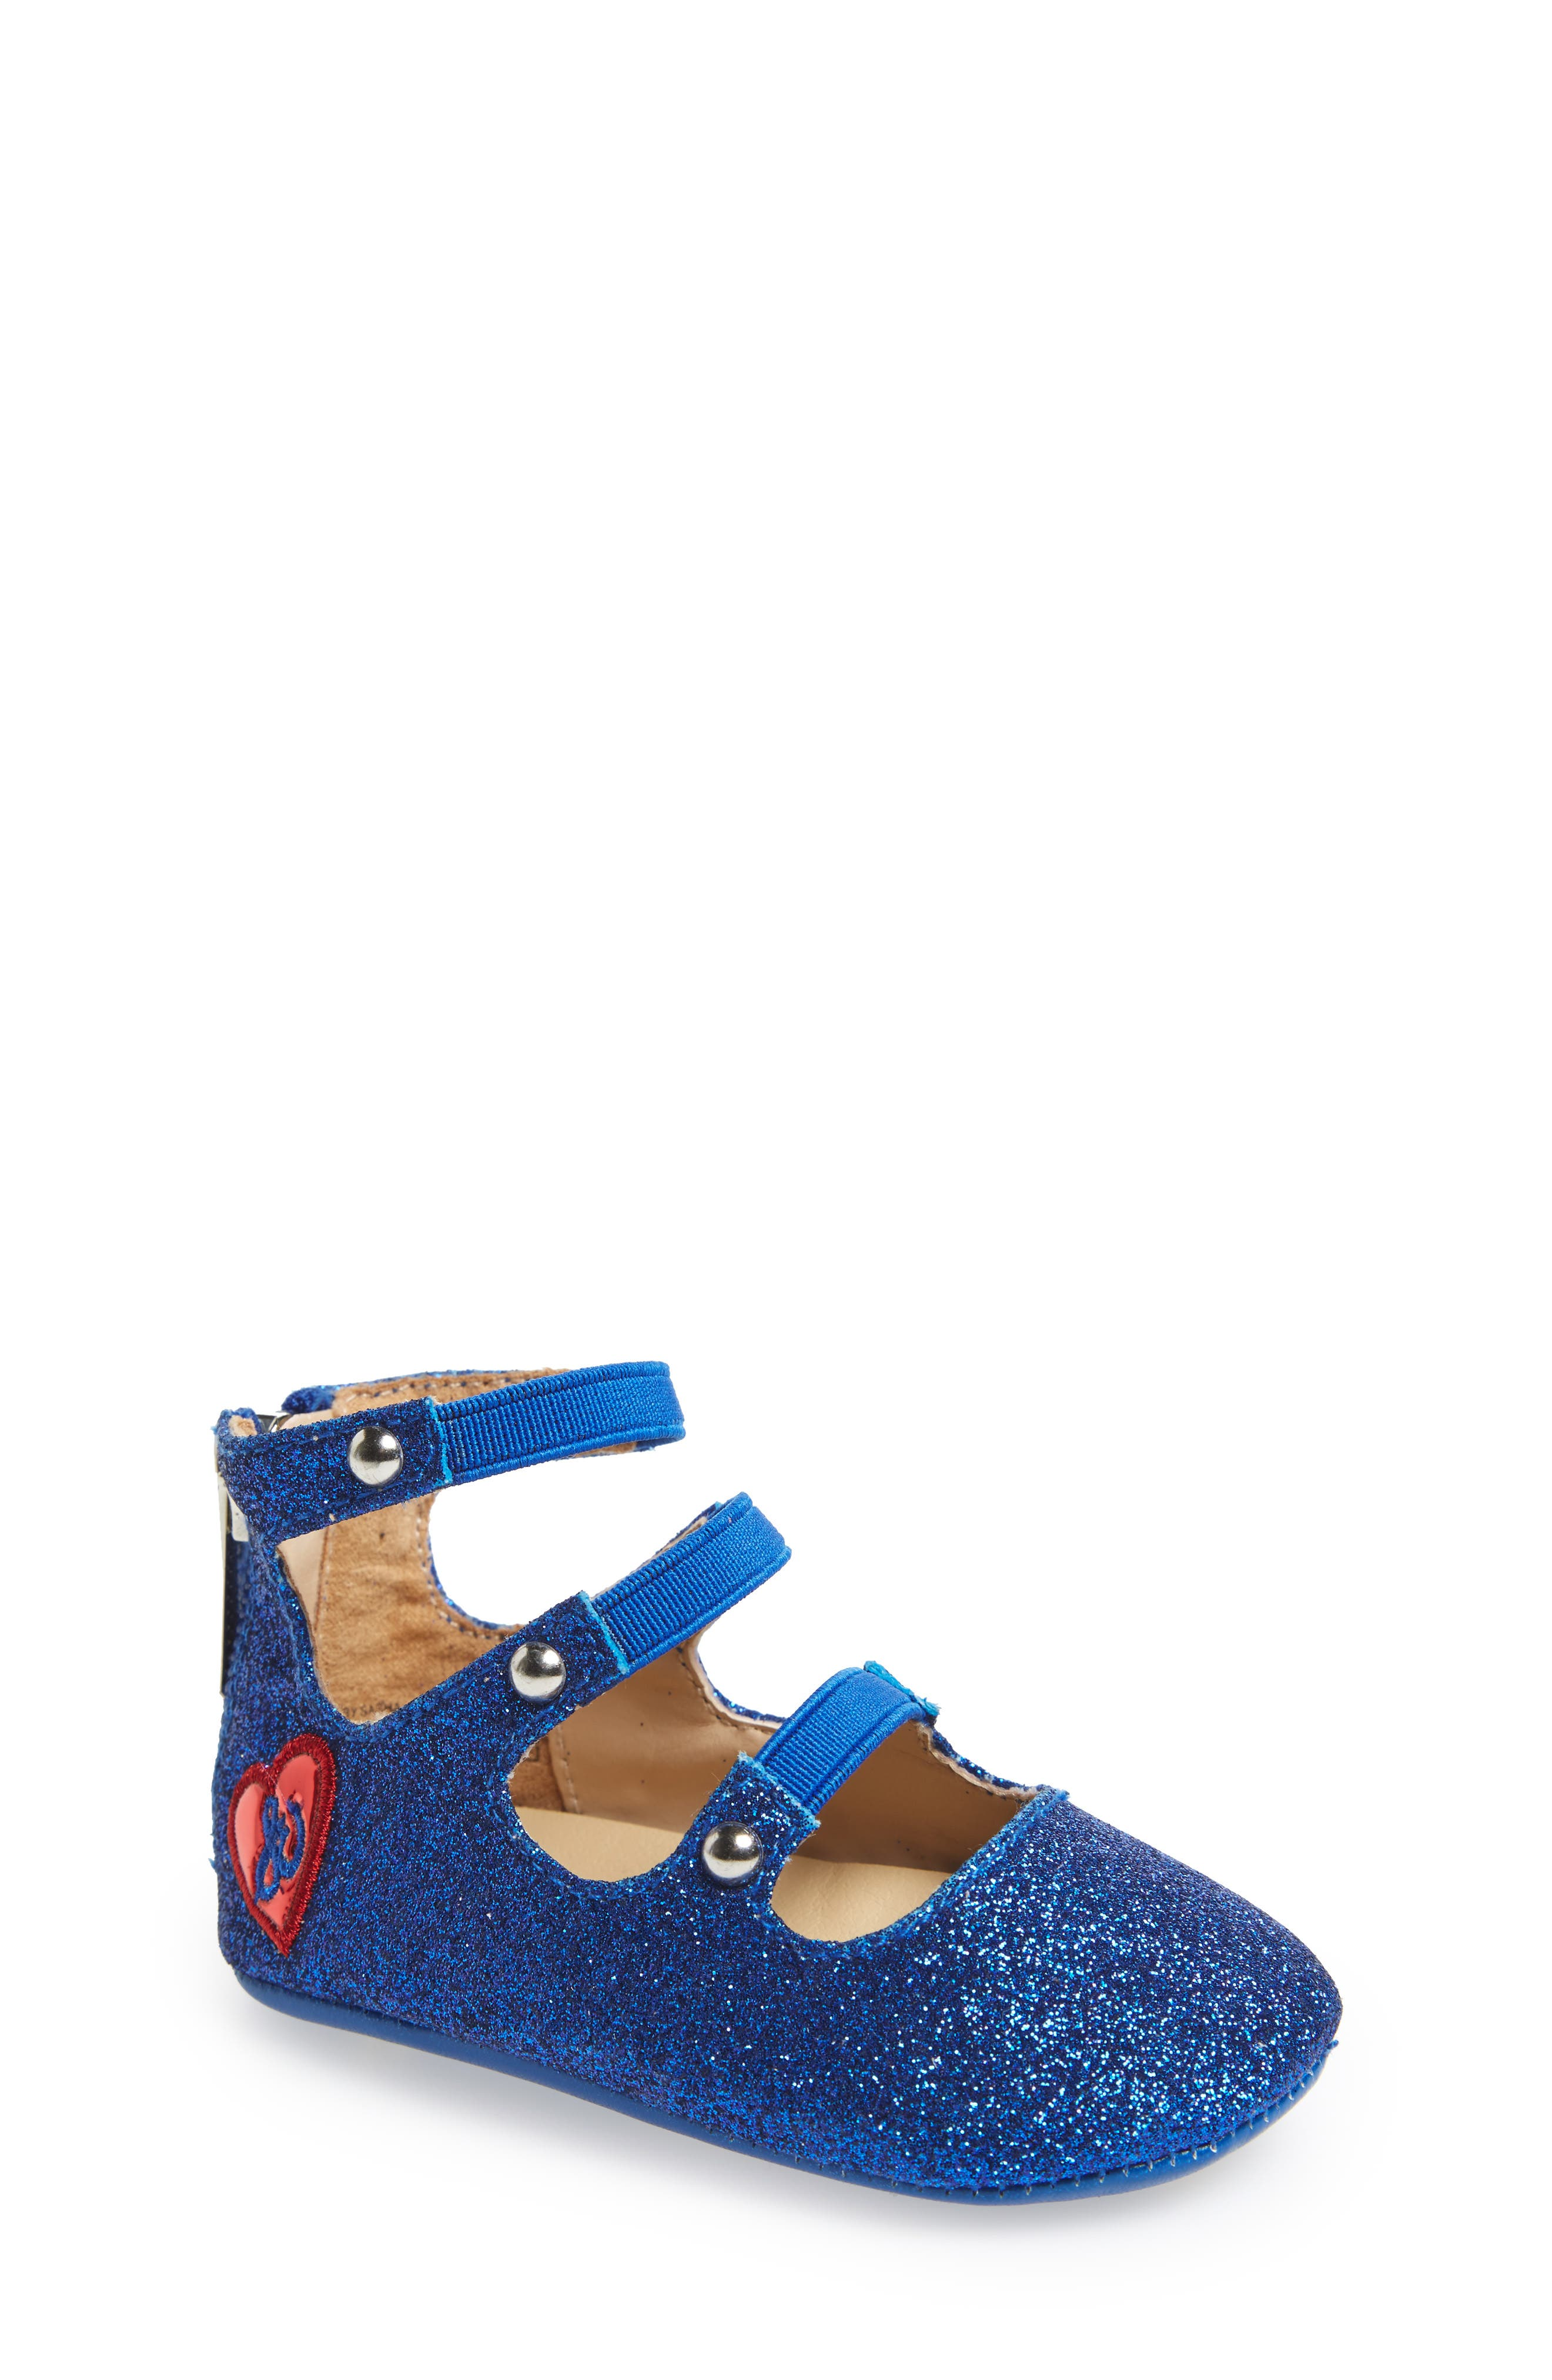 Sam Edelman Baby Sasha Sparkly Crib Shoe (Baby)